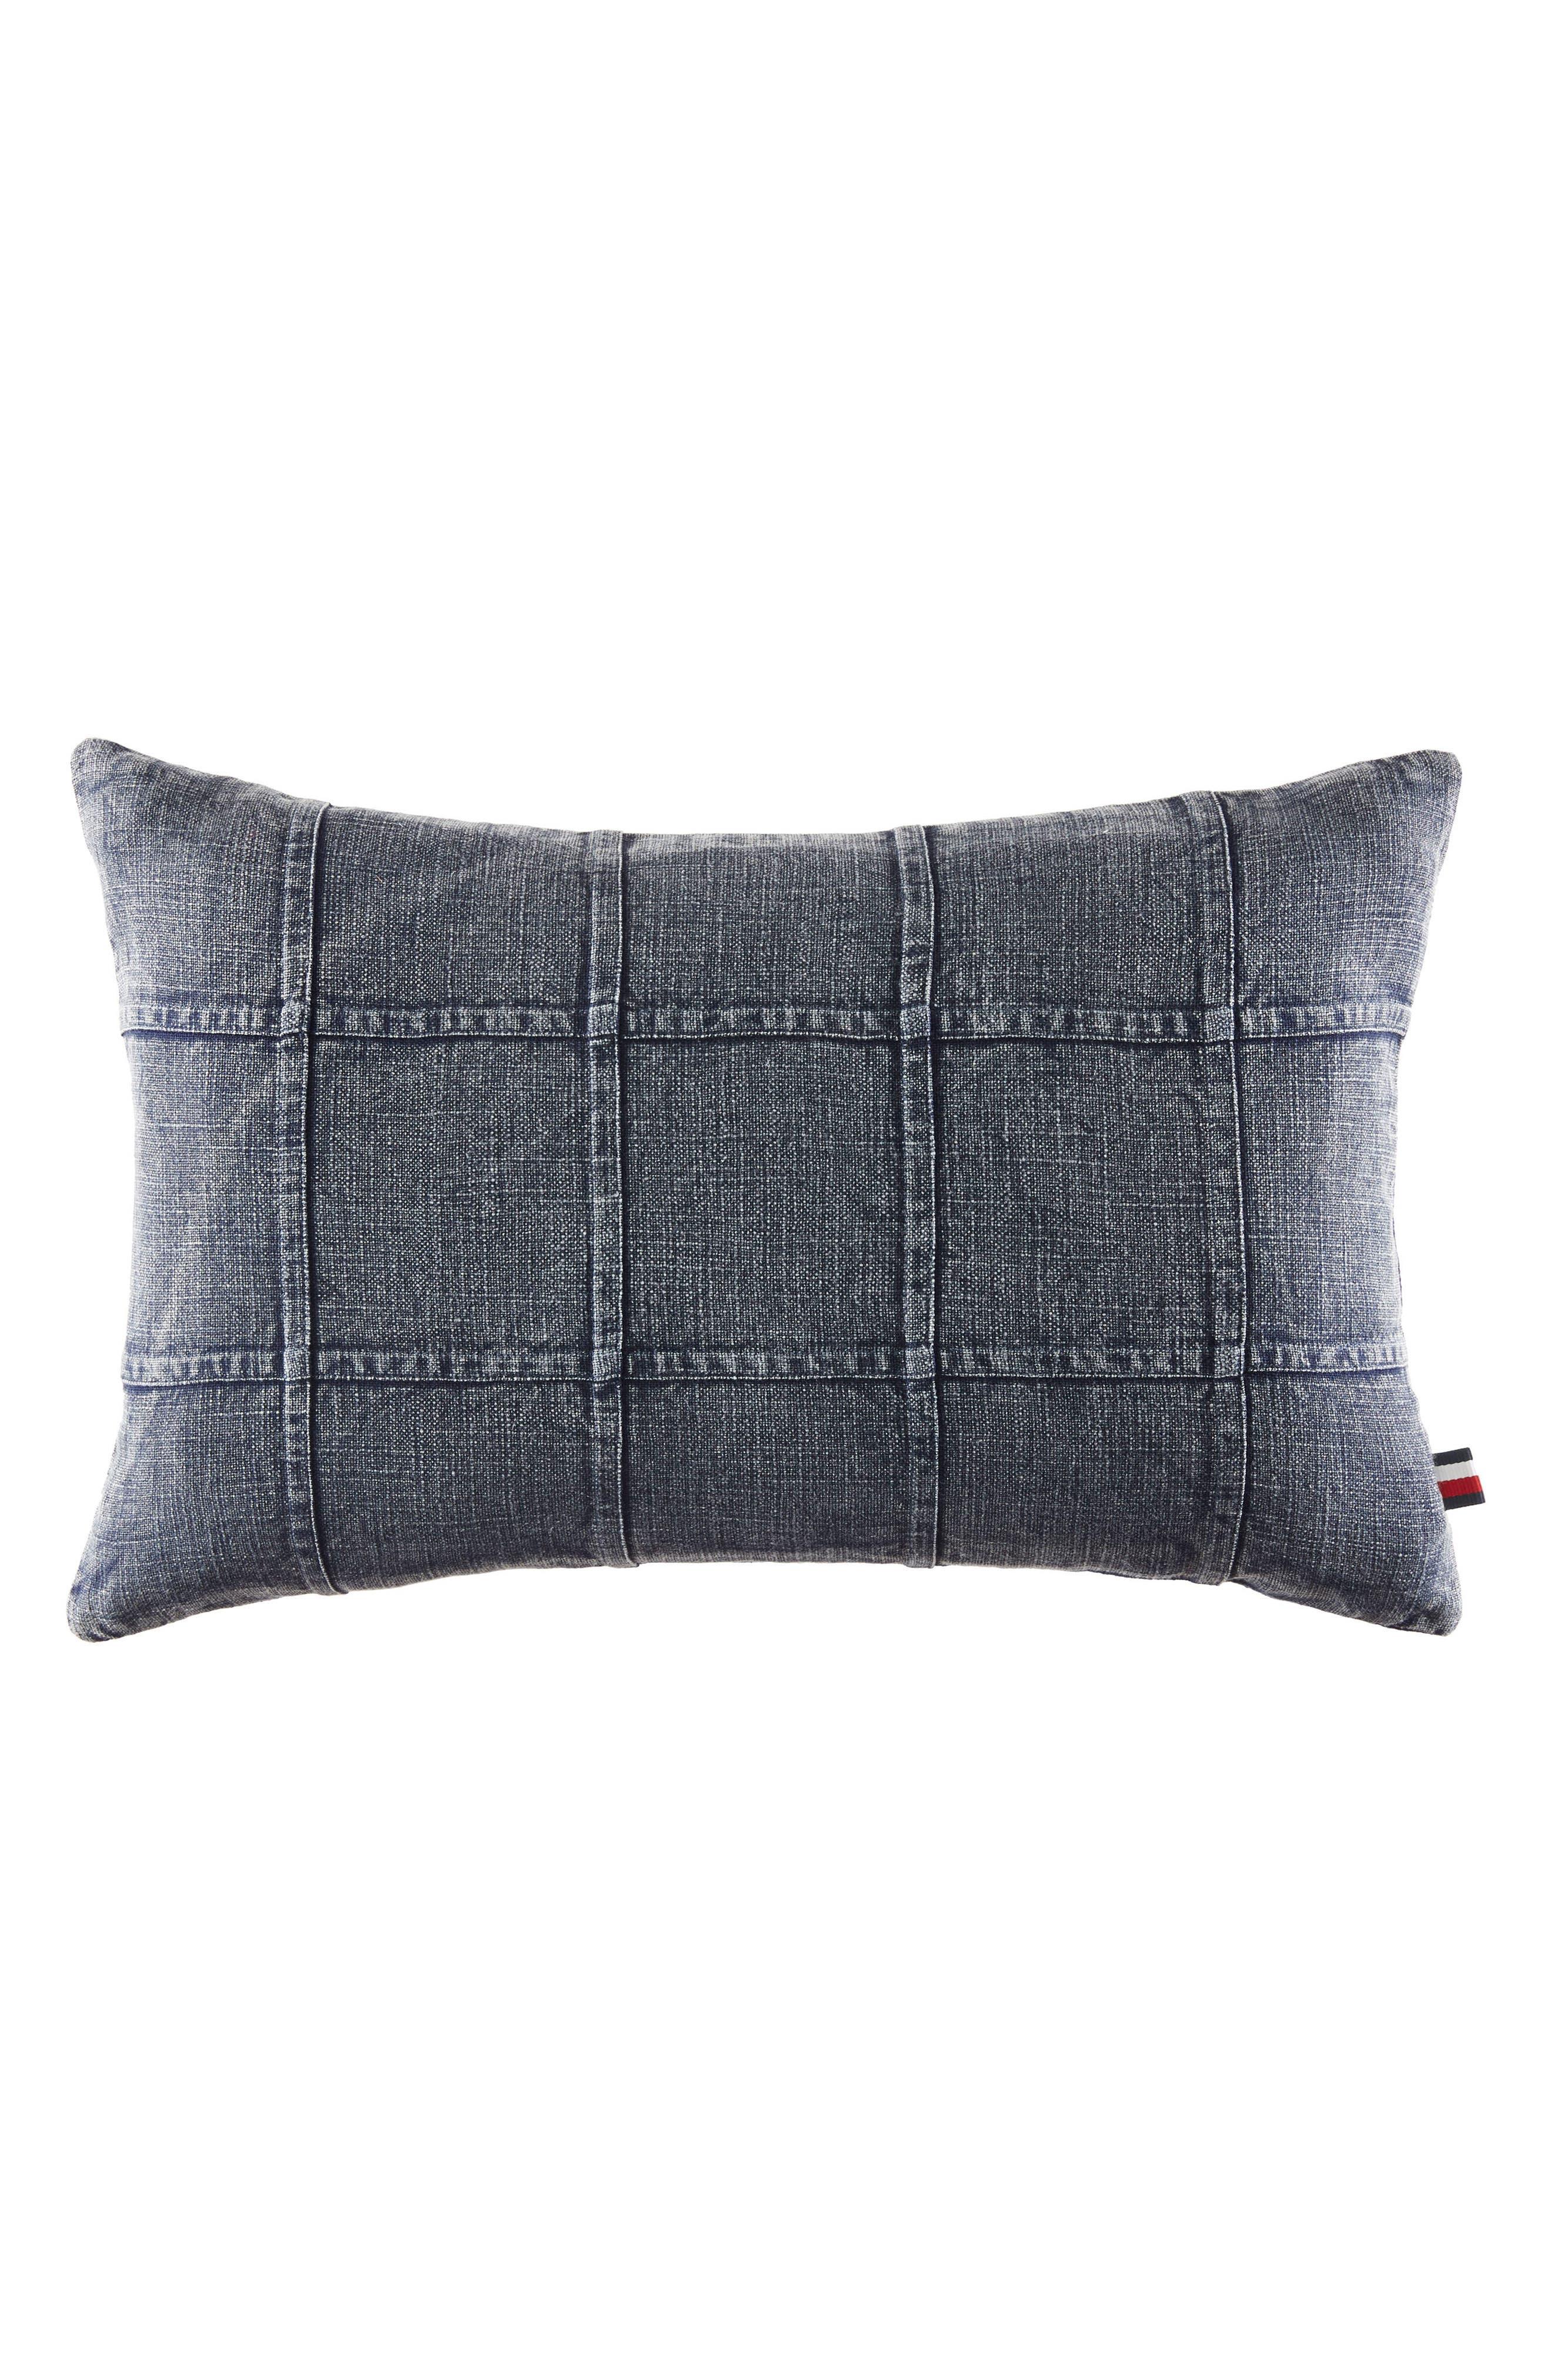 Dusted Indigo Denim Accent Pillow,                             Main thumbnail 1, color,                             Denim Blue